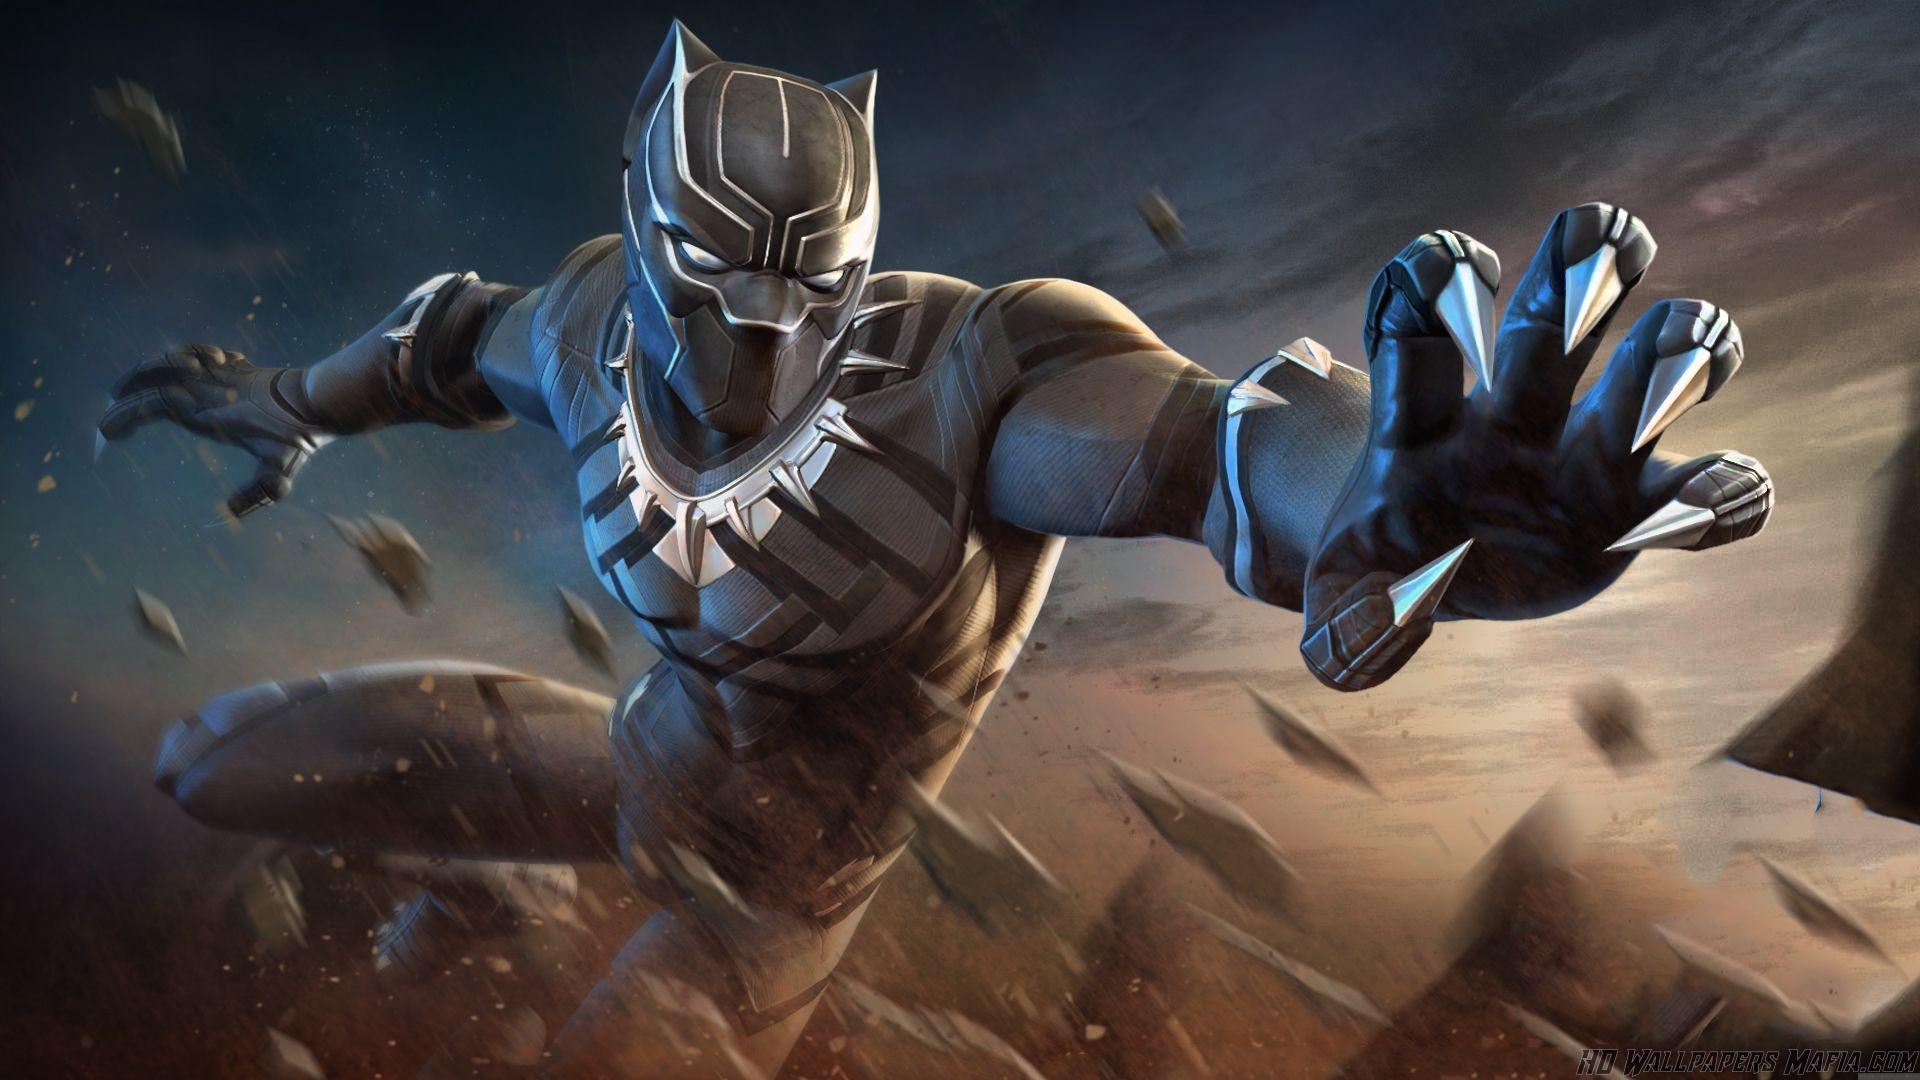 Black Panther 4k Wallpapers Wallpaper Cave